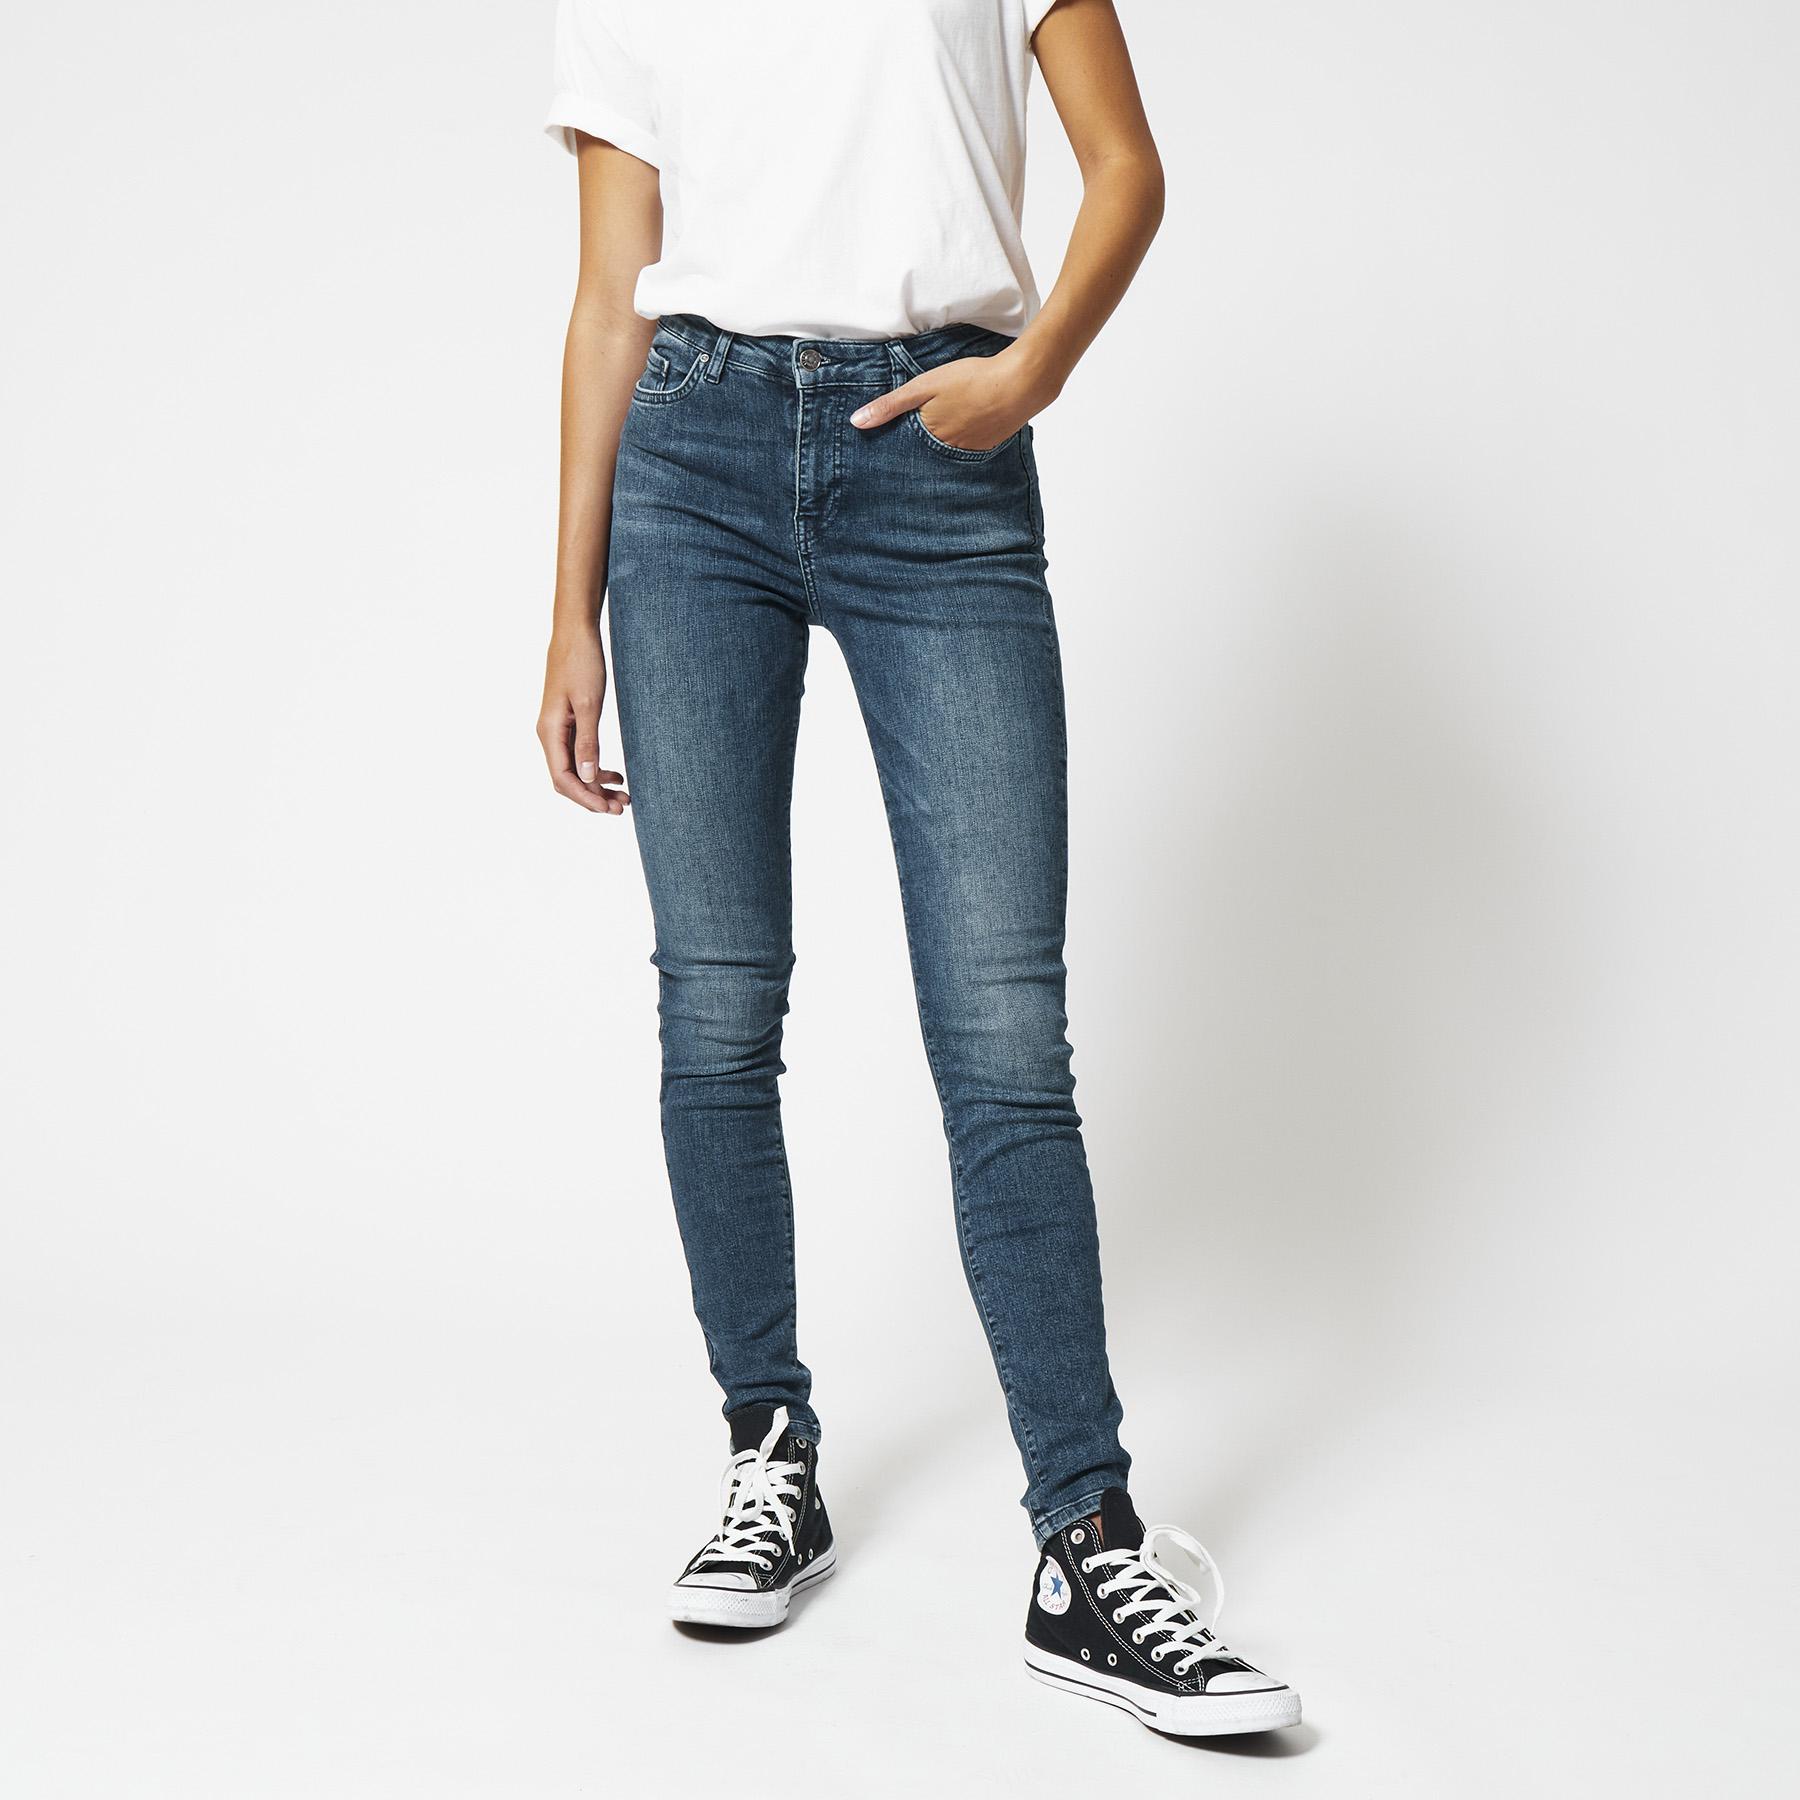 Women Skinny jeans stretch Blue Buy Online